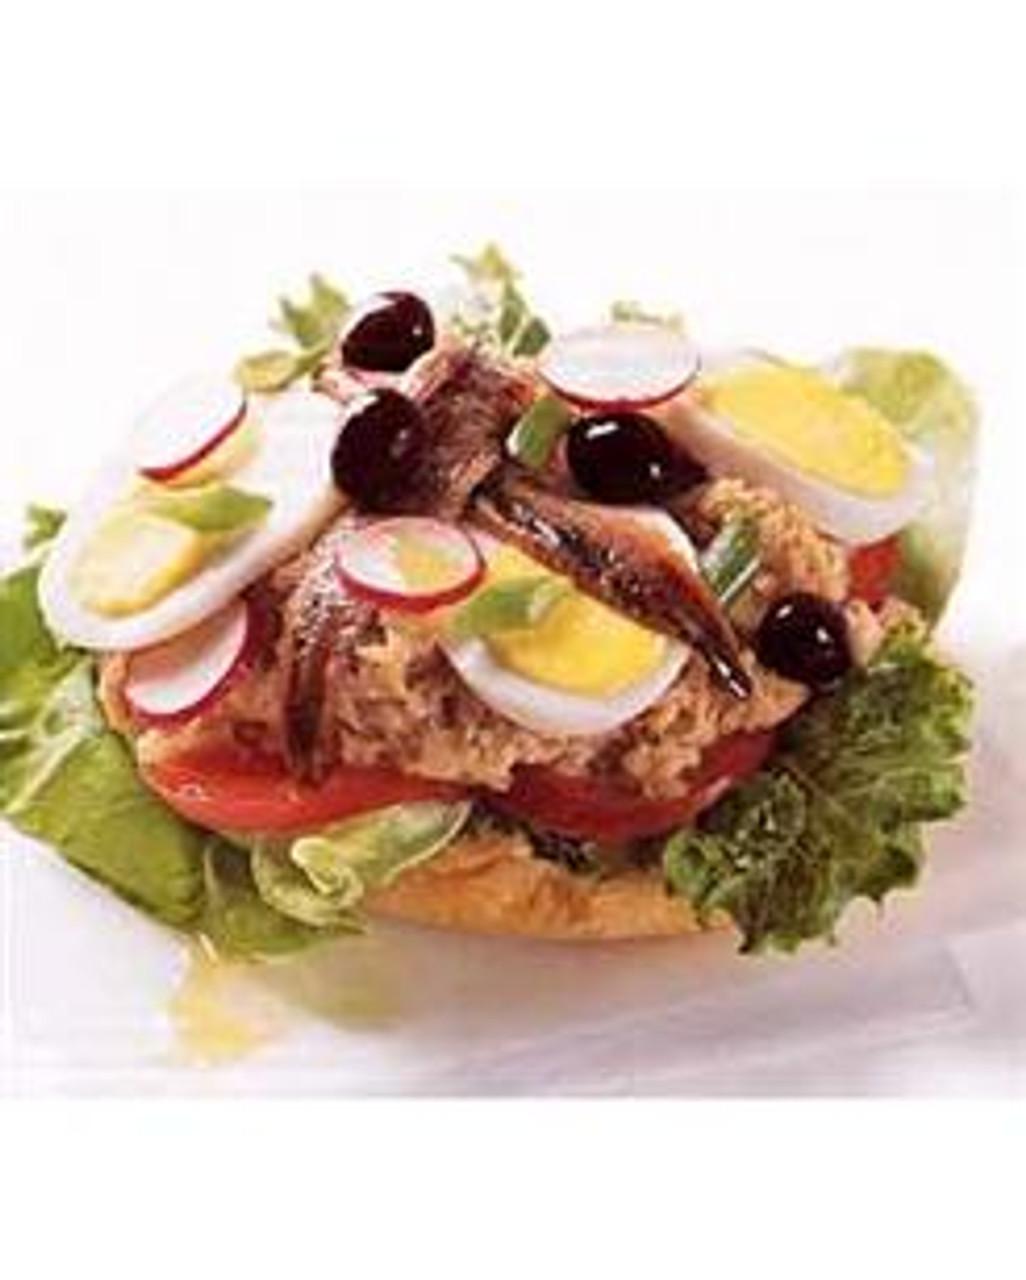 Nicoise Tuna Sandwich